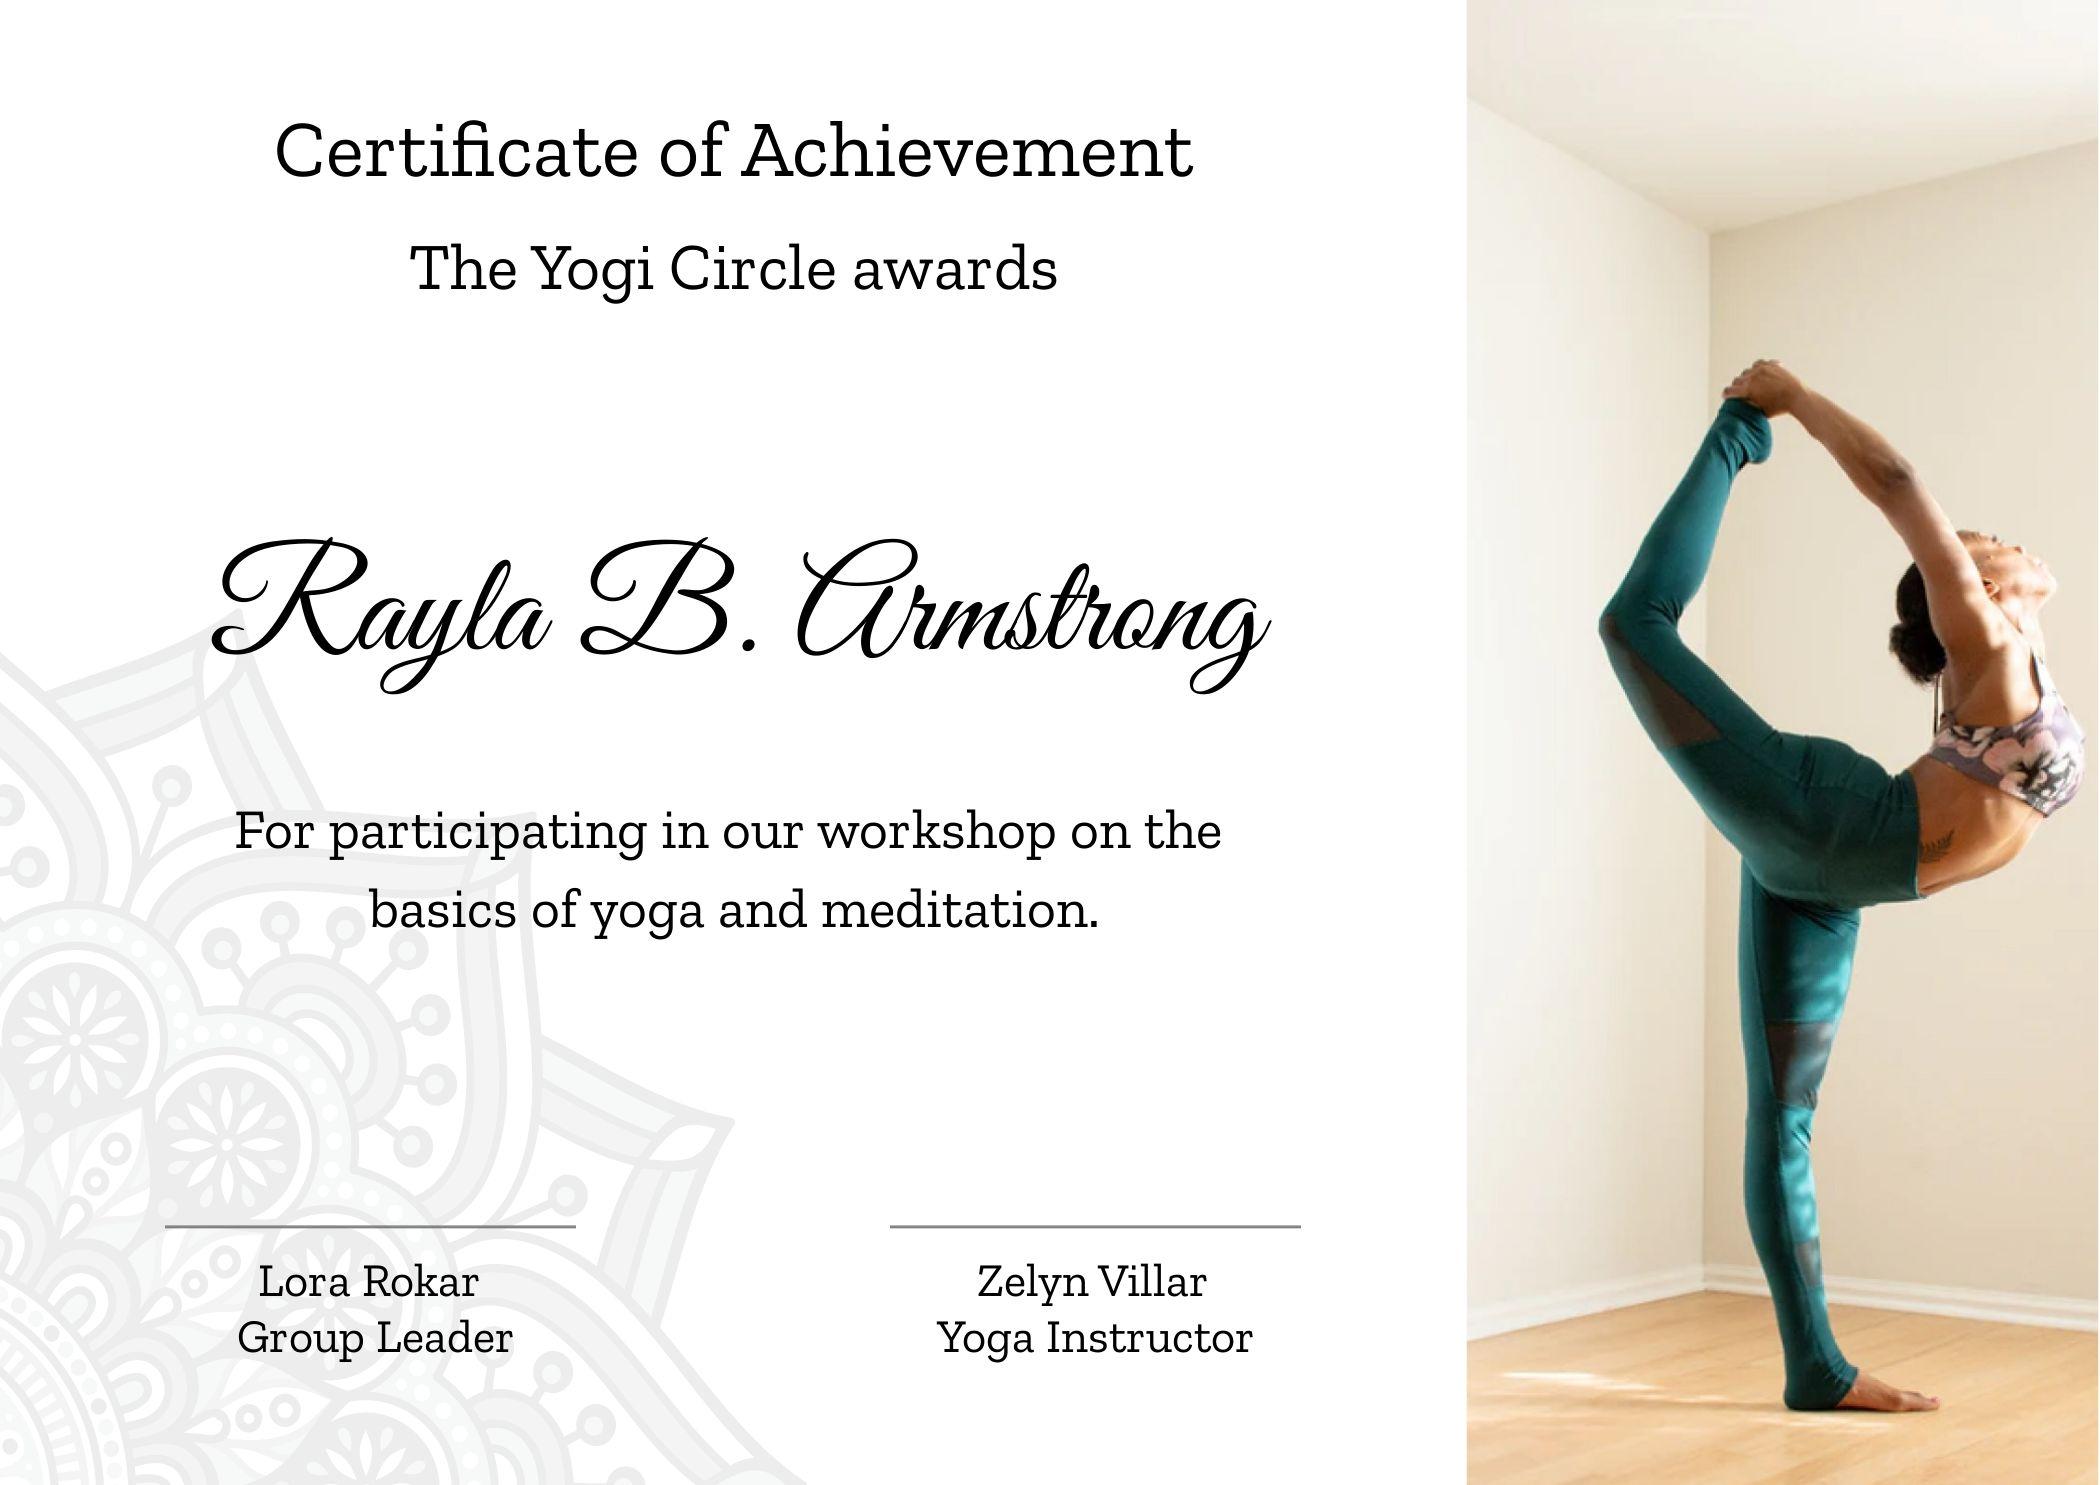 Yoga School Certificate Of Achievement